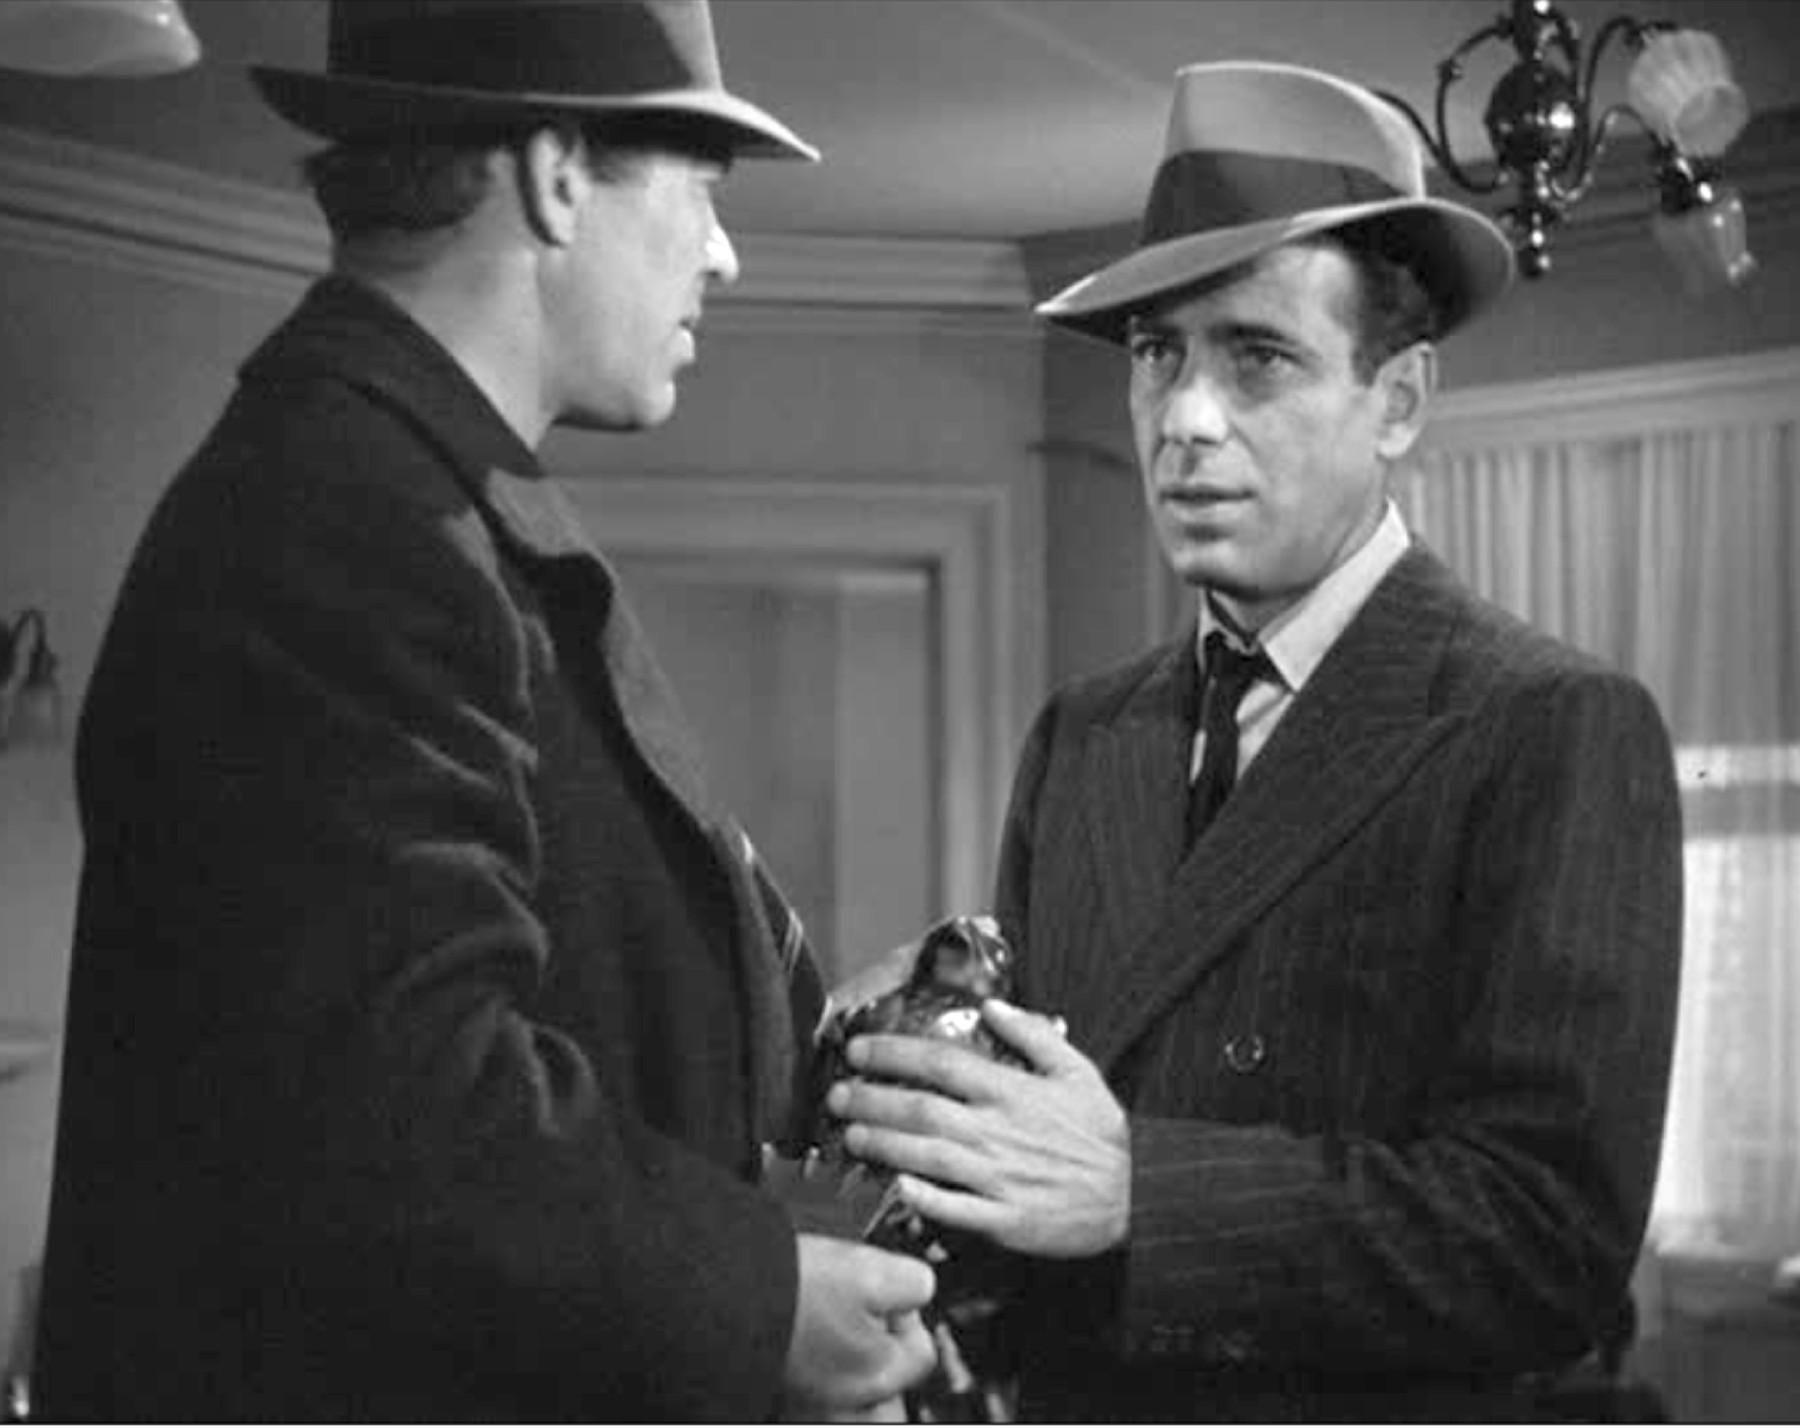 Humphrey Bogart R Ward Bond Maltese Falcon 1941 The Thing Dreams Are Made Of Bogart Humphrey Bogart Classic Hollywood